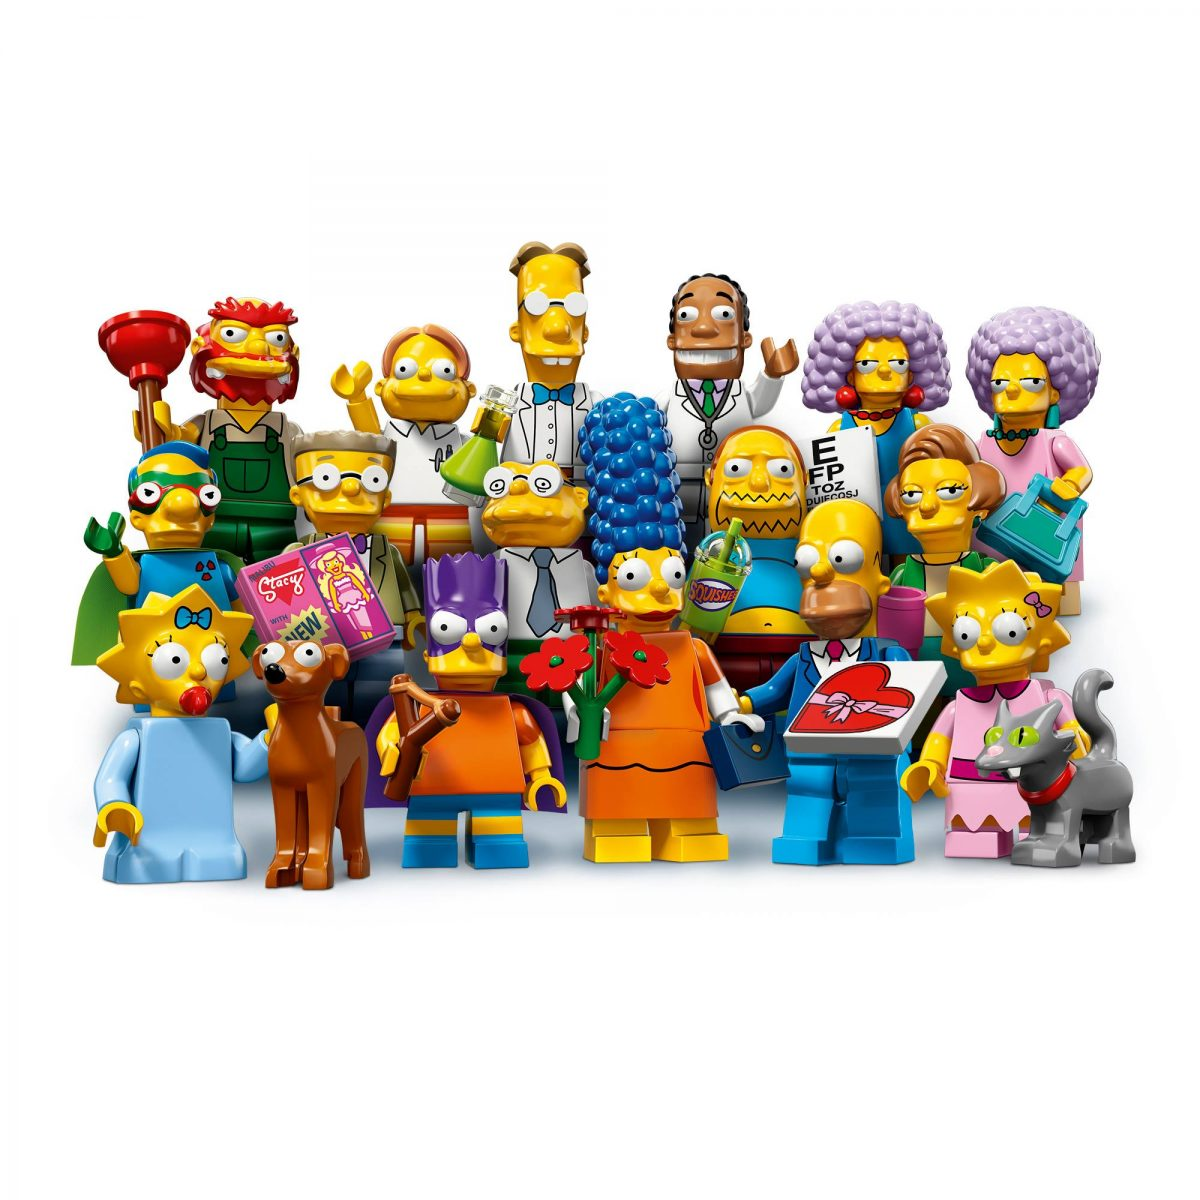 LEGO 71009 Minifiguren The Simpsons Serie 2